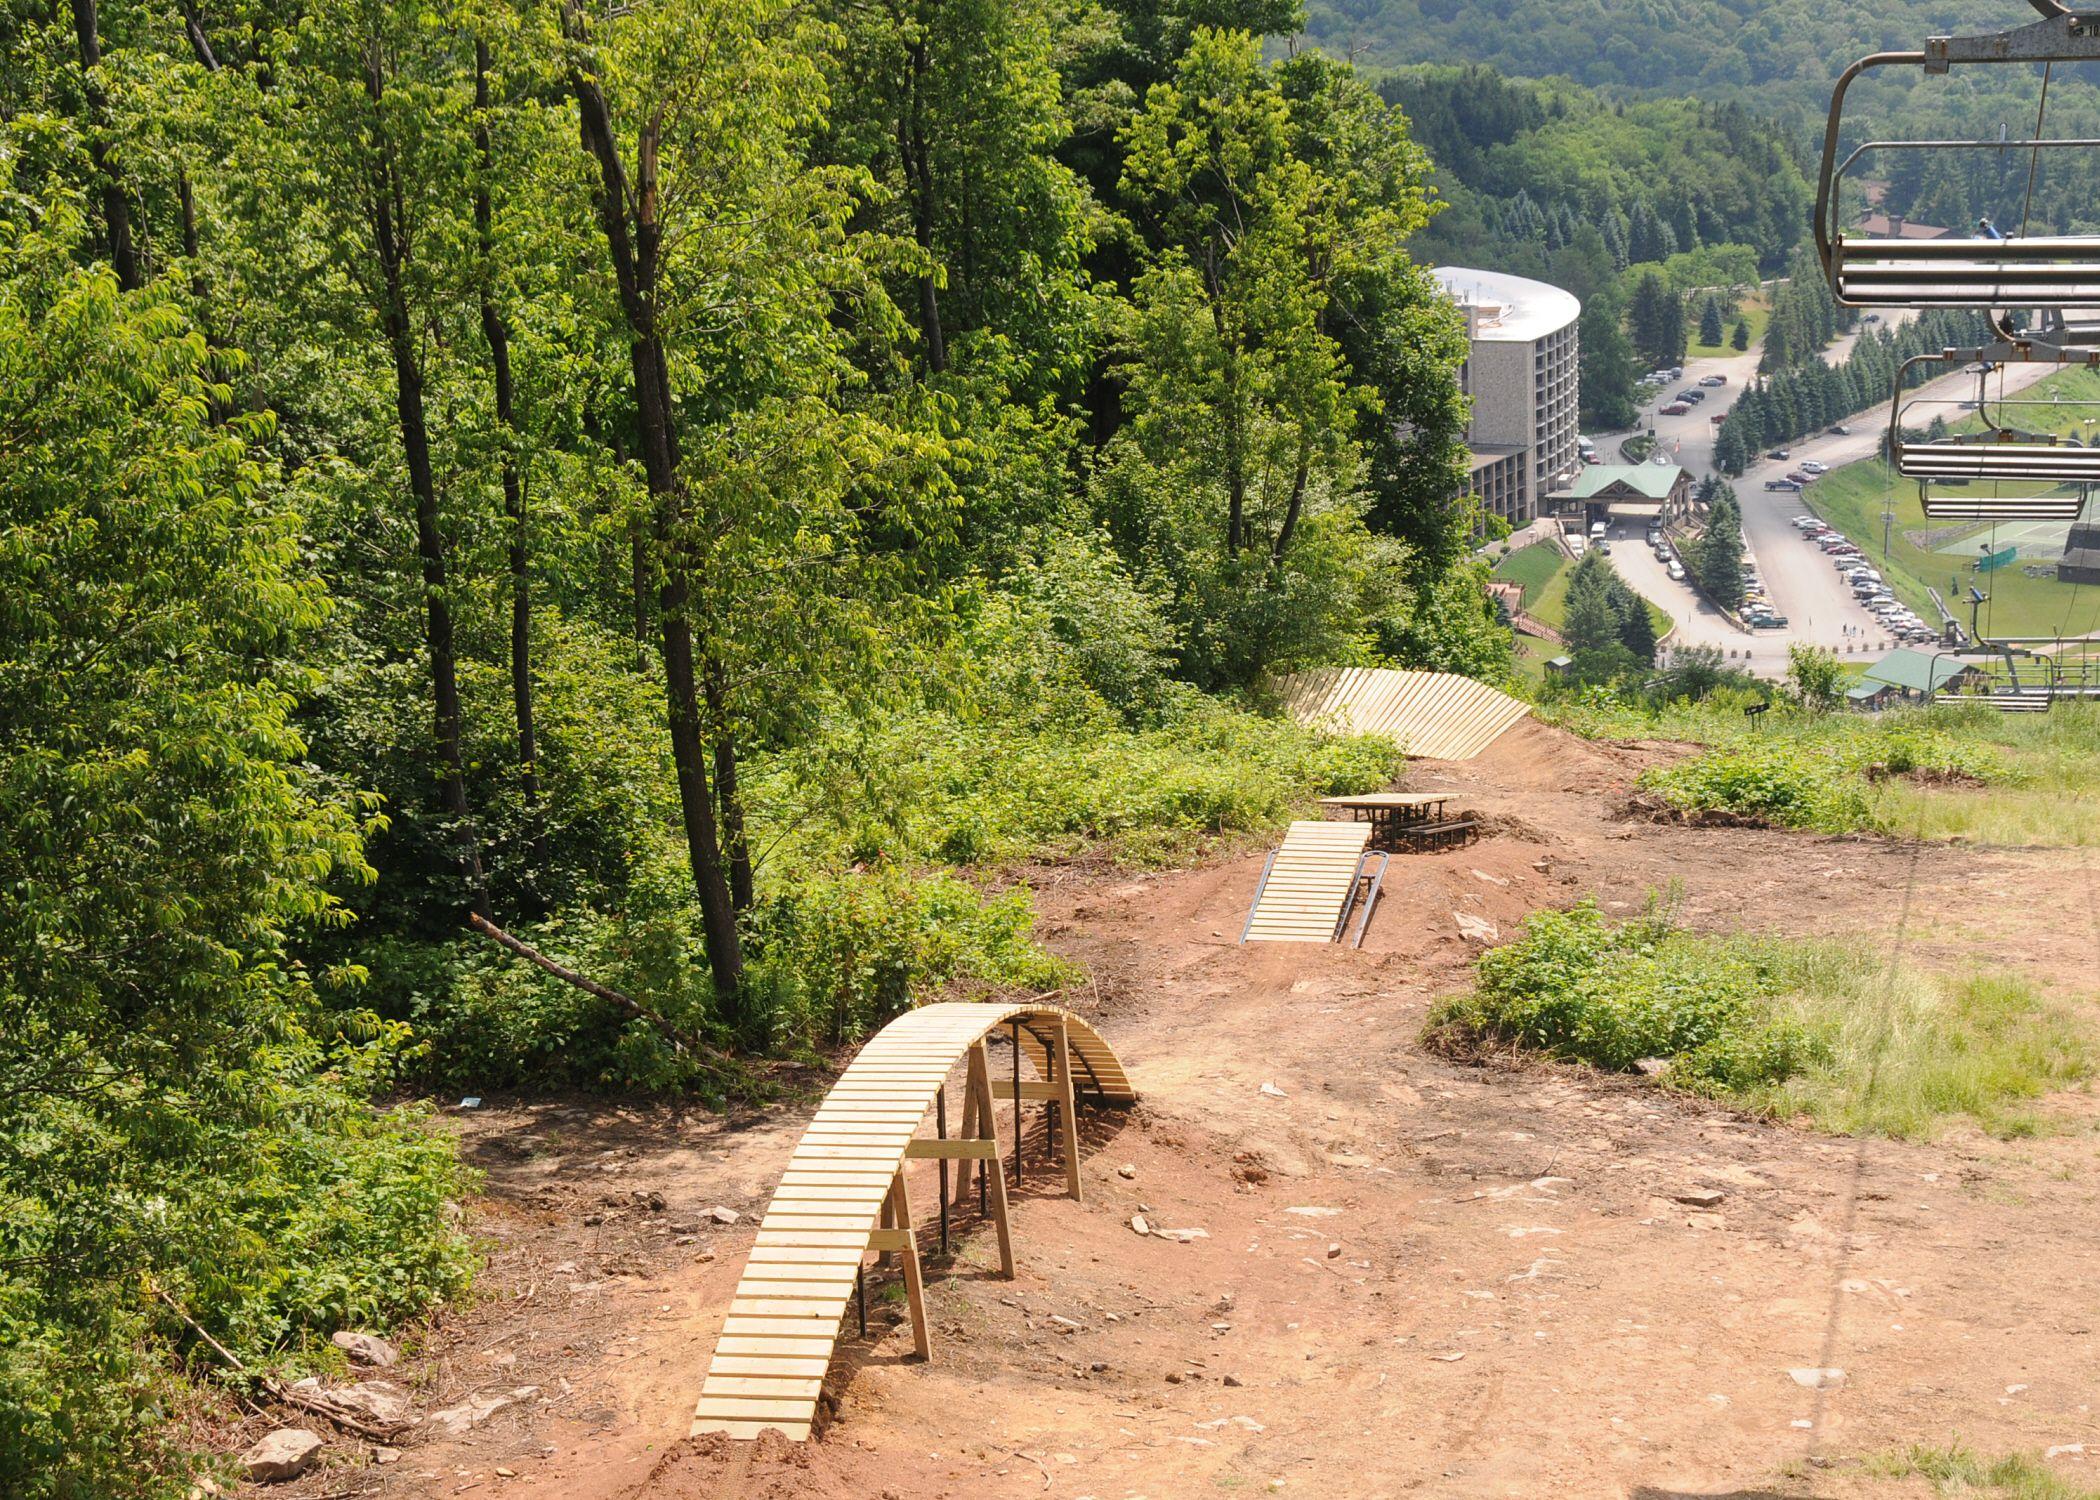 56 Best Mountain Biking Images On Pinterest Extreme Sports